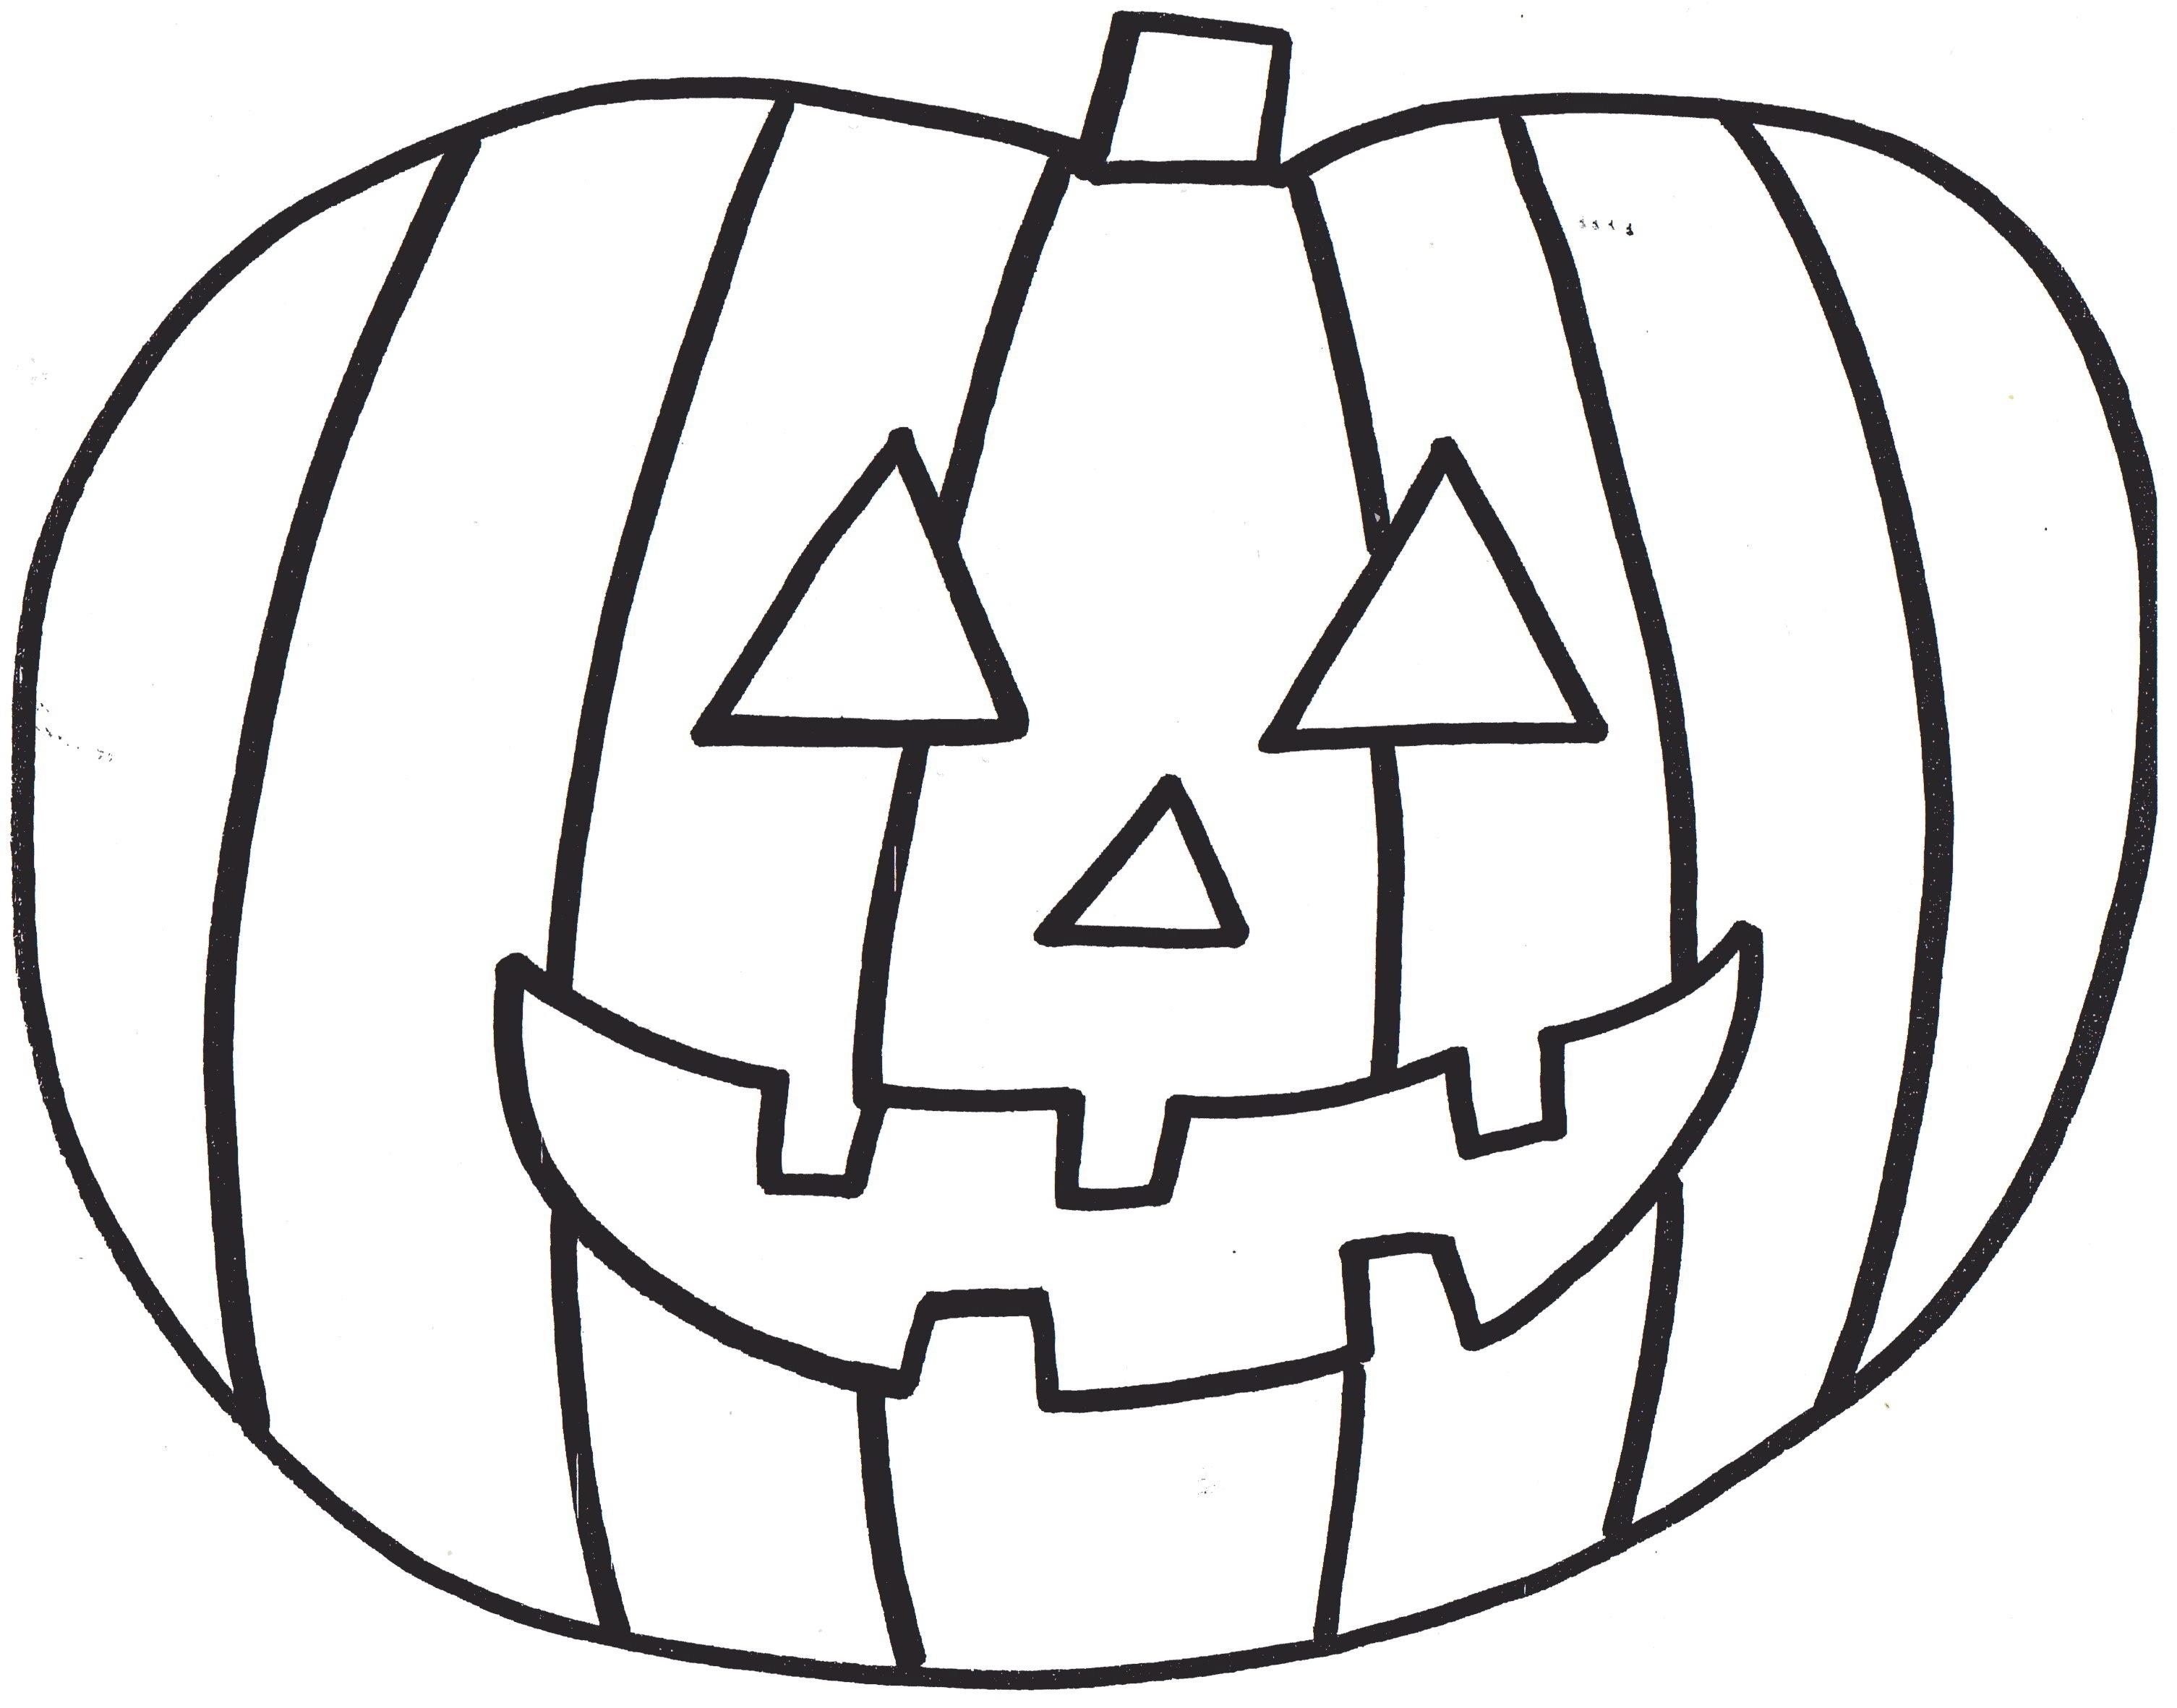 3011x2363 High Tech Pumpkin Coloring Pages Pdf Jack O Lantern Halloween Pag